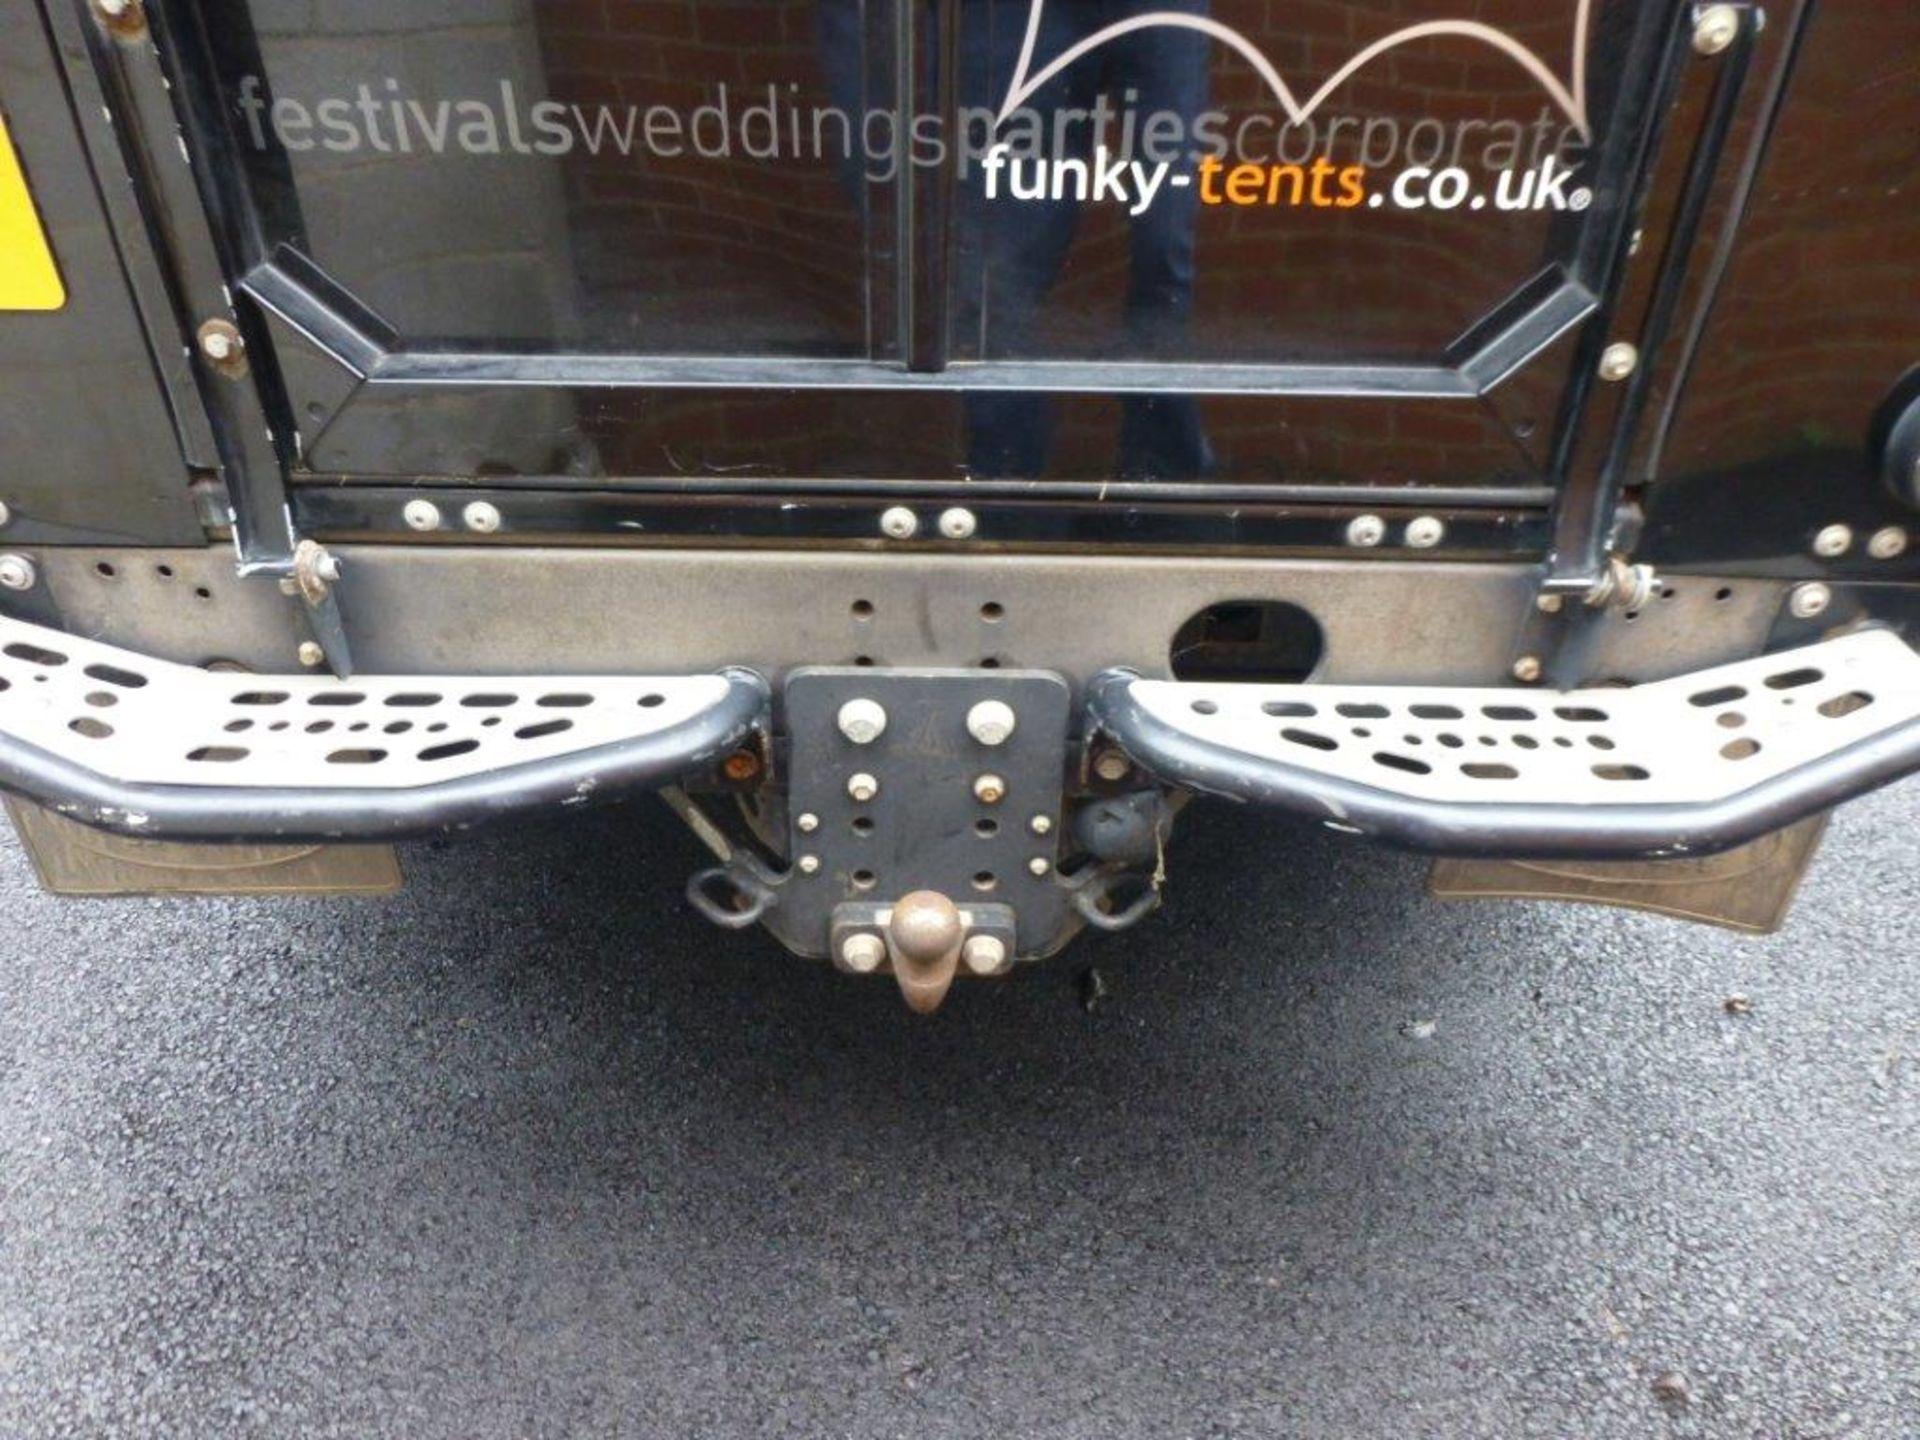 Land Rover Defender 110 XS Bowler double cab pickup TDCi (2.2). Reg no. FN15 LBK. Reg. date 23/03/ - Image 12 of 12